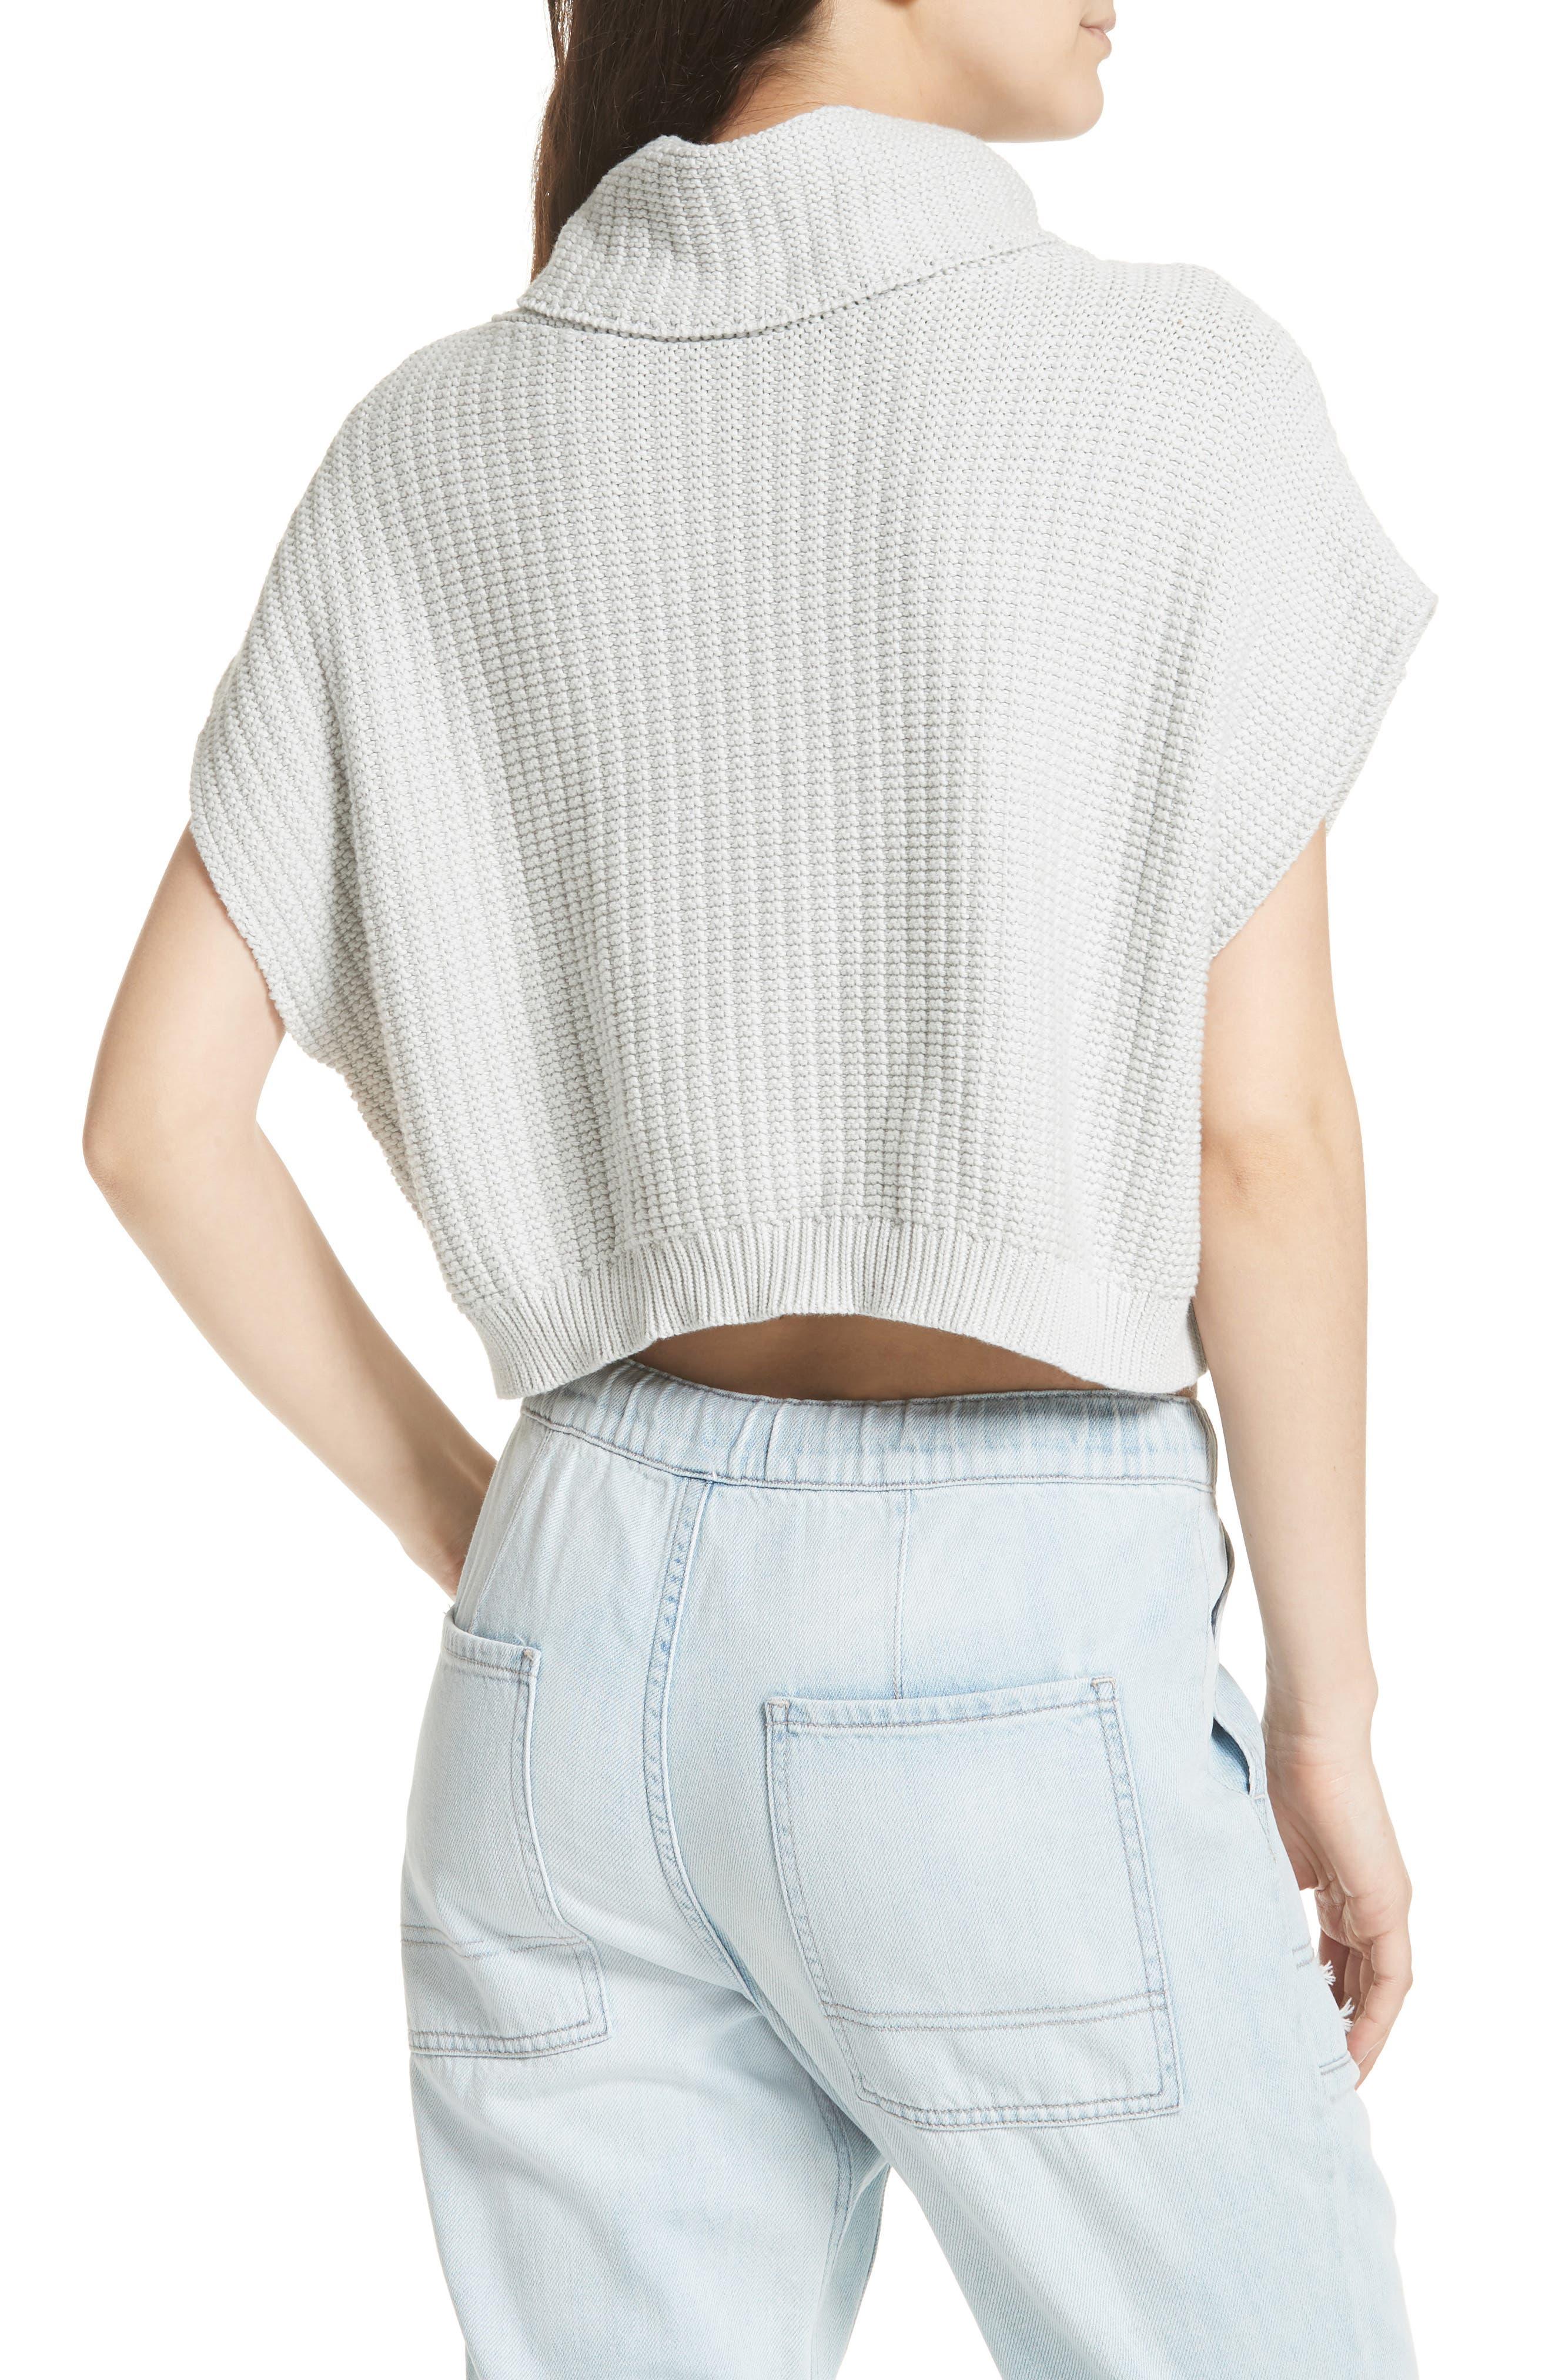 Keep It Simple Vest,                             Alternate thumbnail 2, color,                             Light Grey